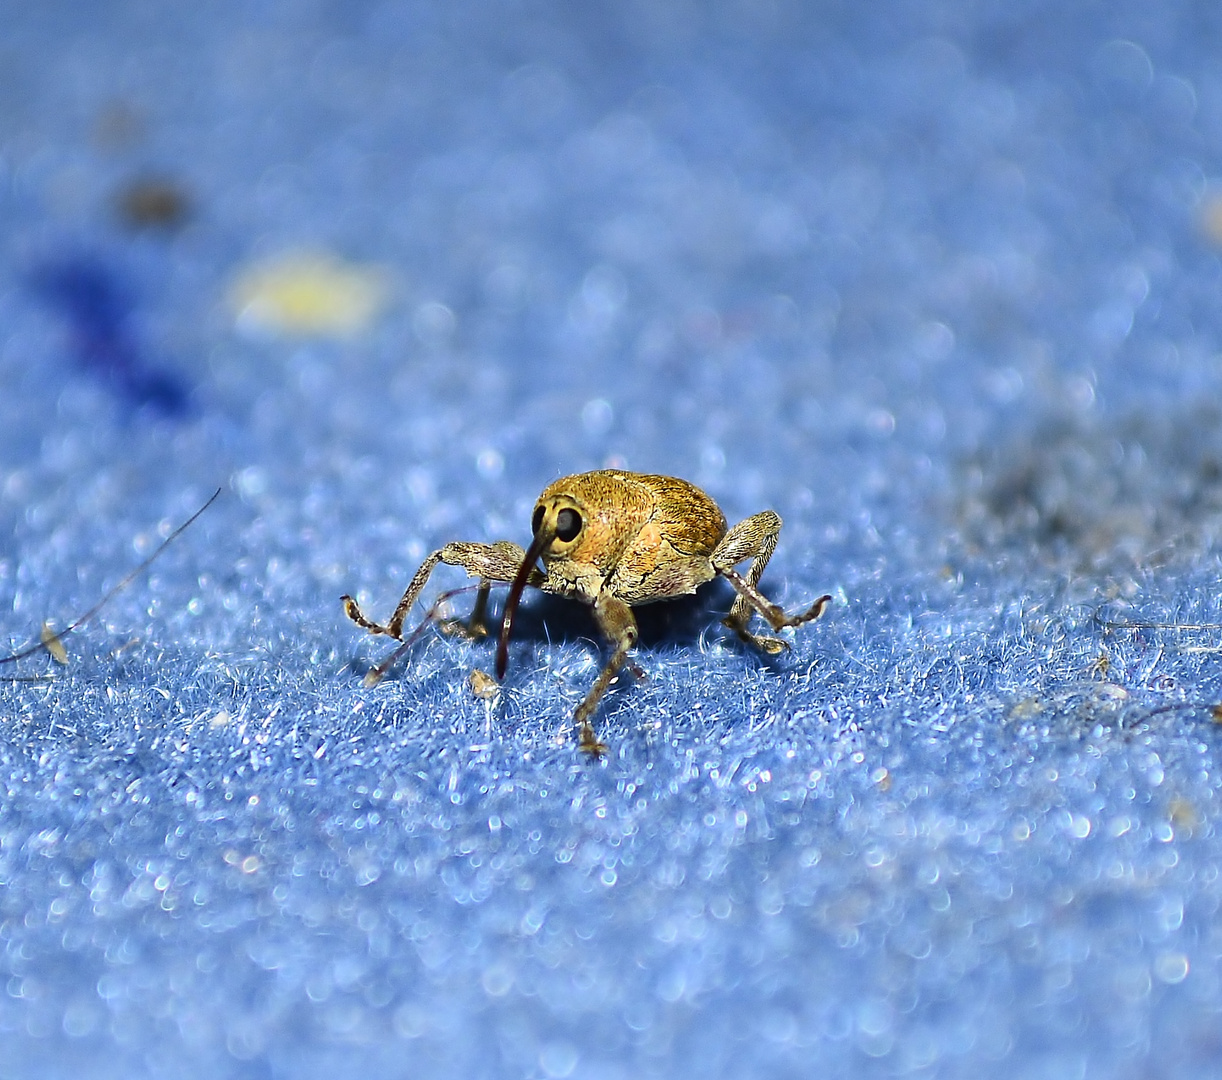 Kleiner seltsamer Käfer maschiert über den Teppich 2